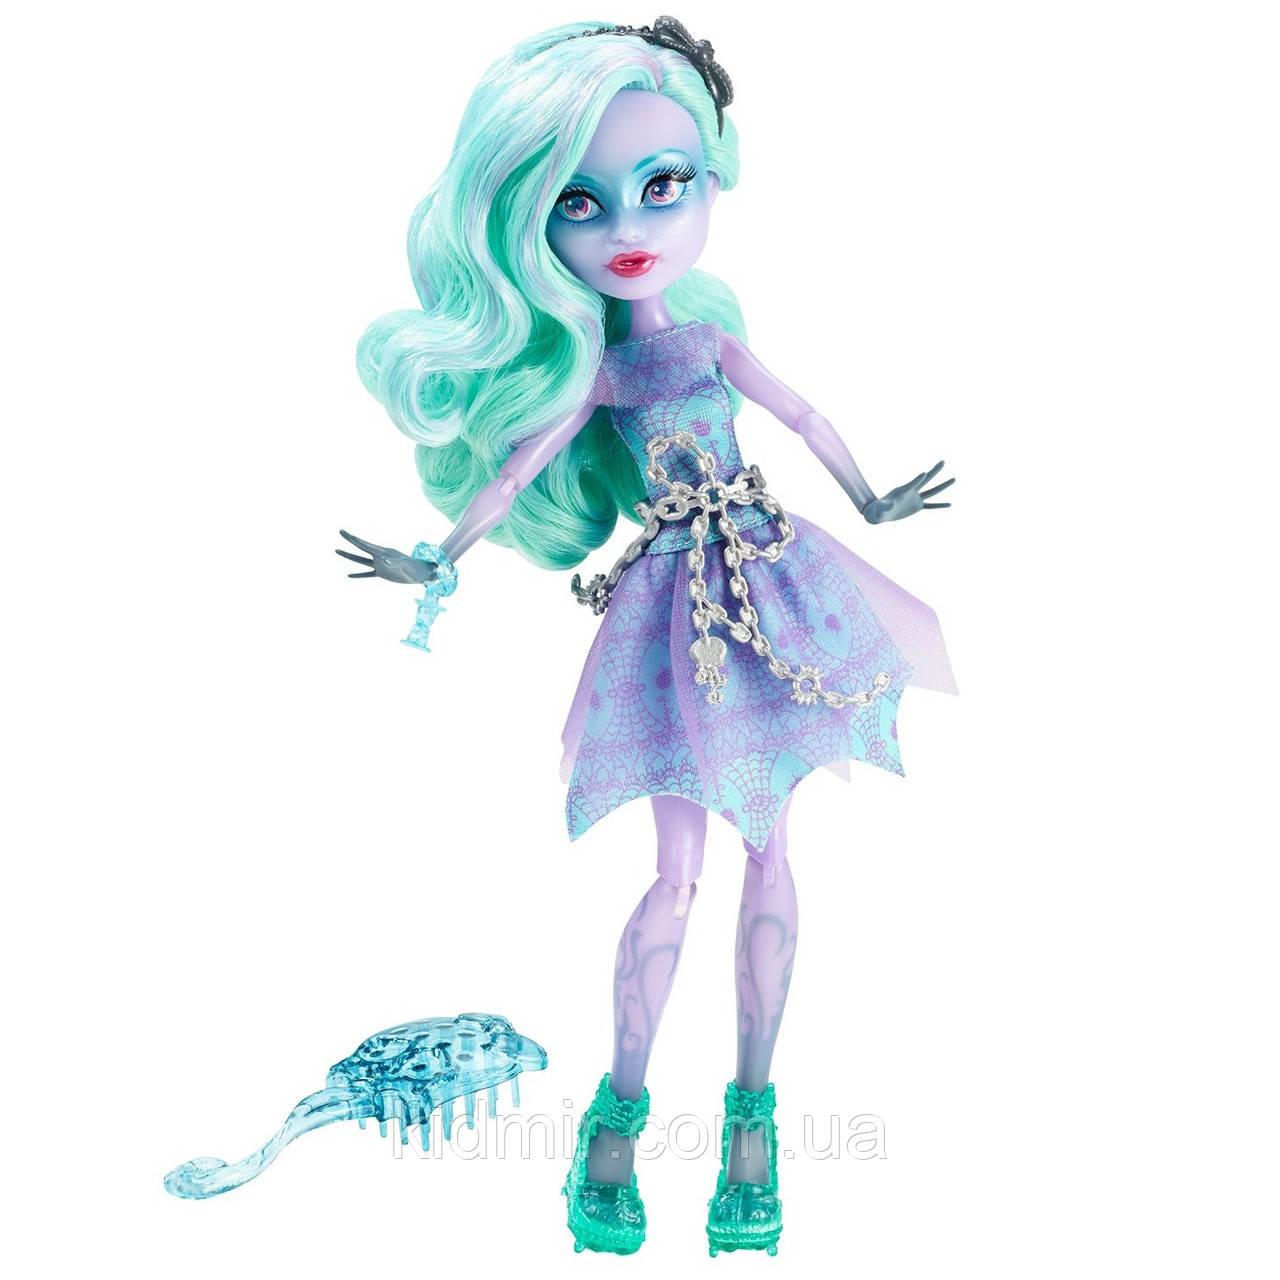 Кукла Monster High Твайла (Twyla) из серии Haunted Getting Ghostly Монстр Хай